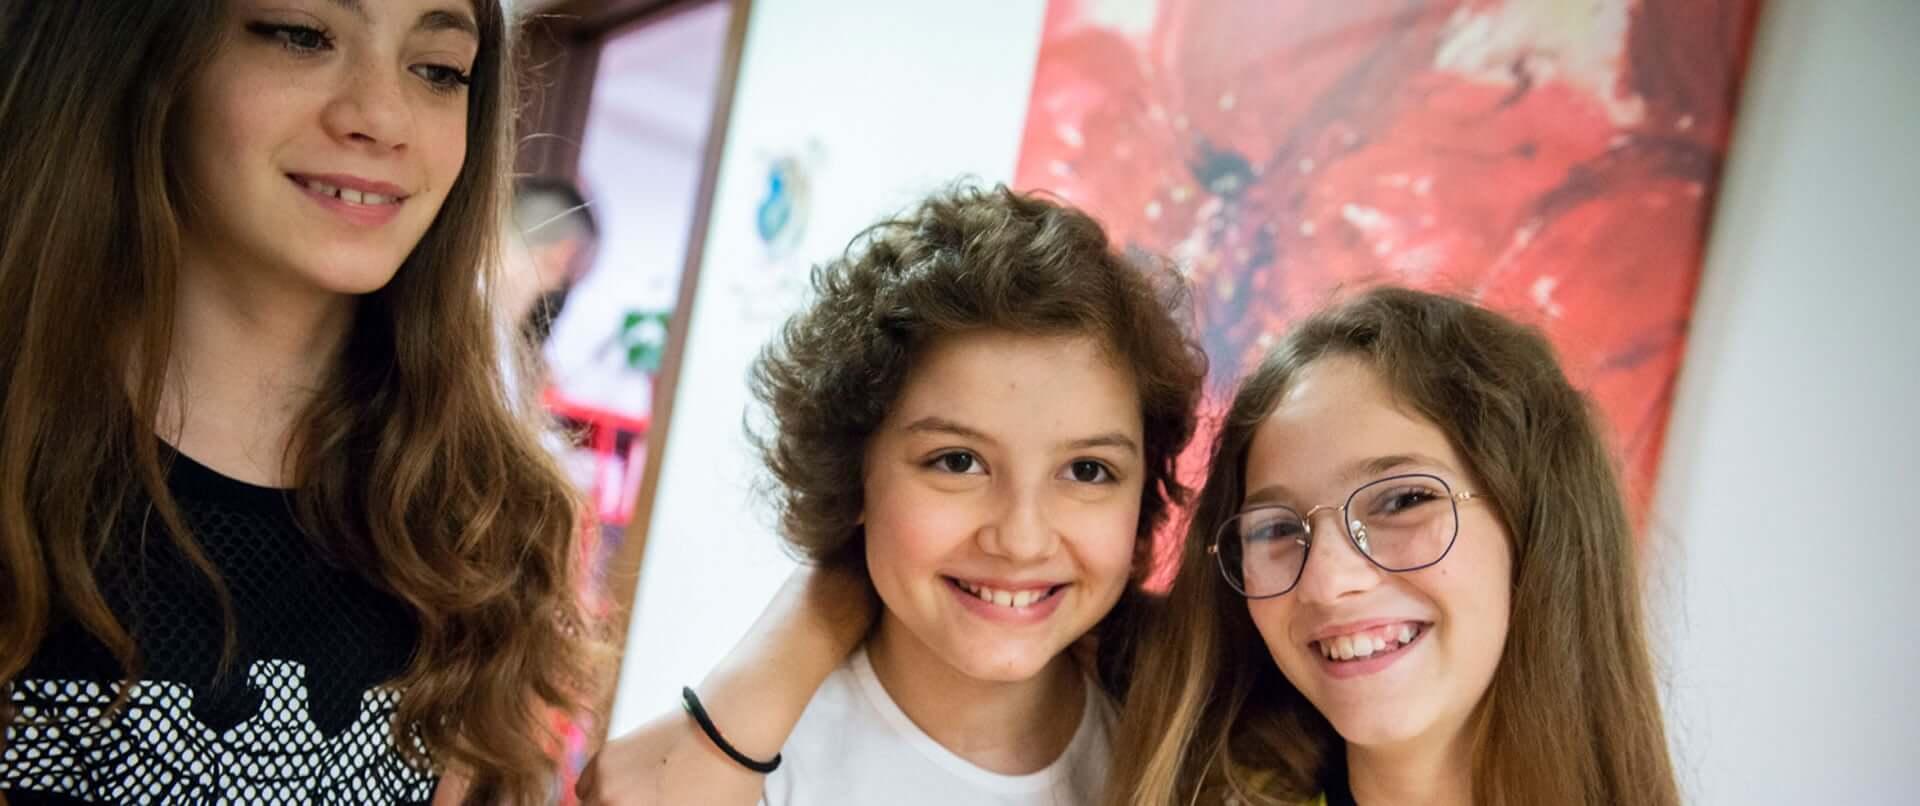 Tre ragazzine sorridenti